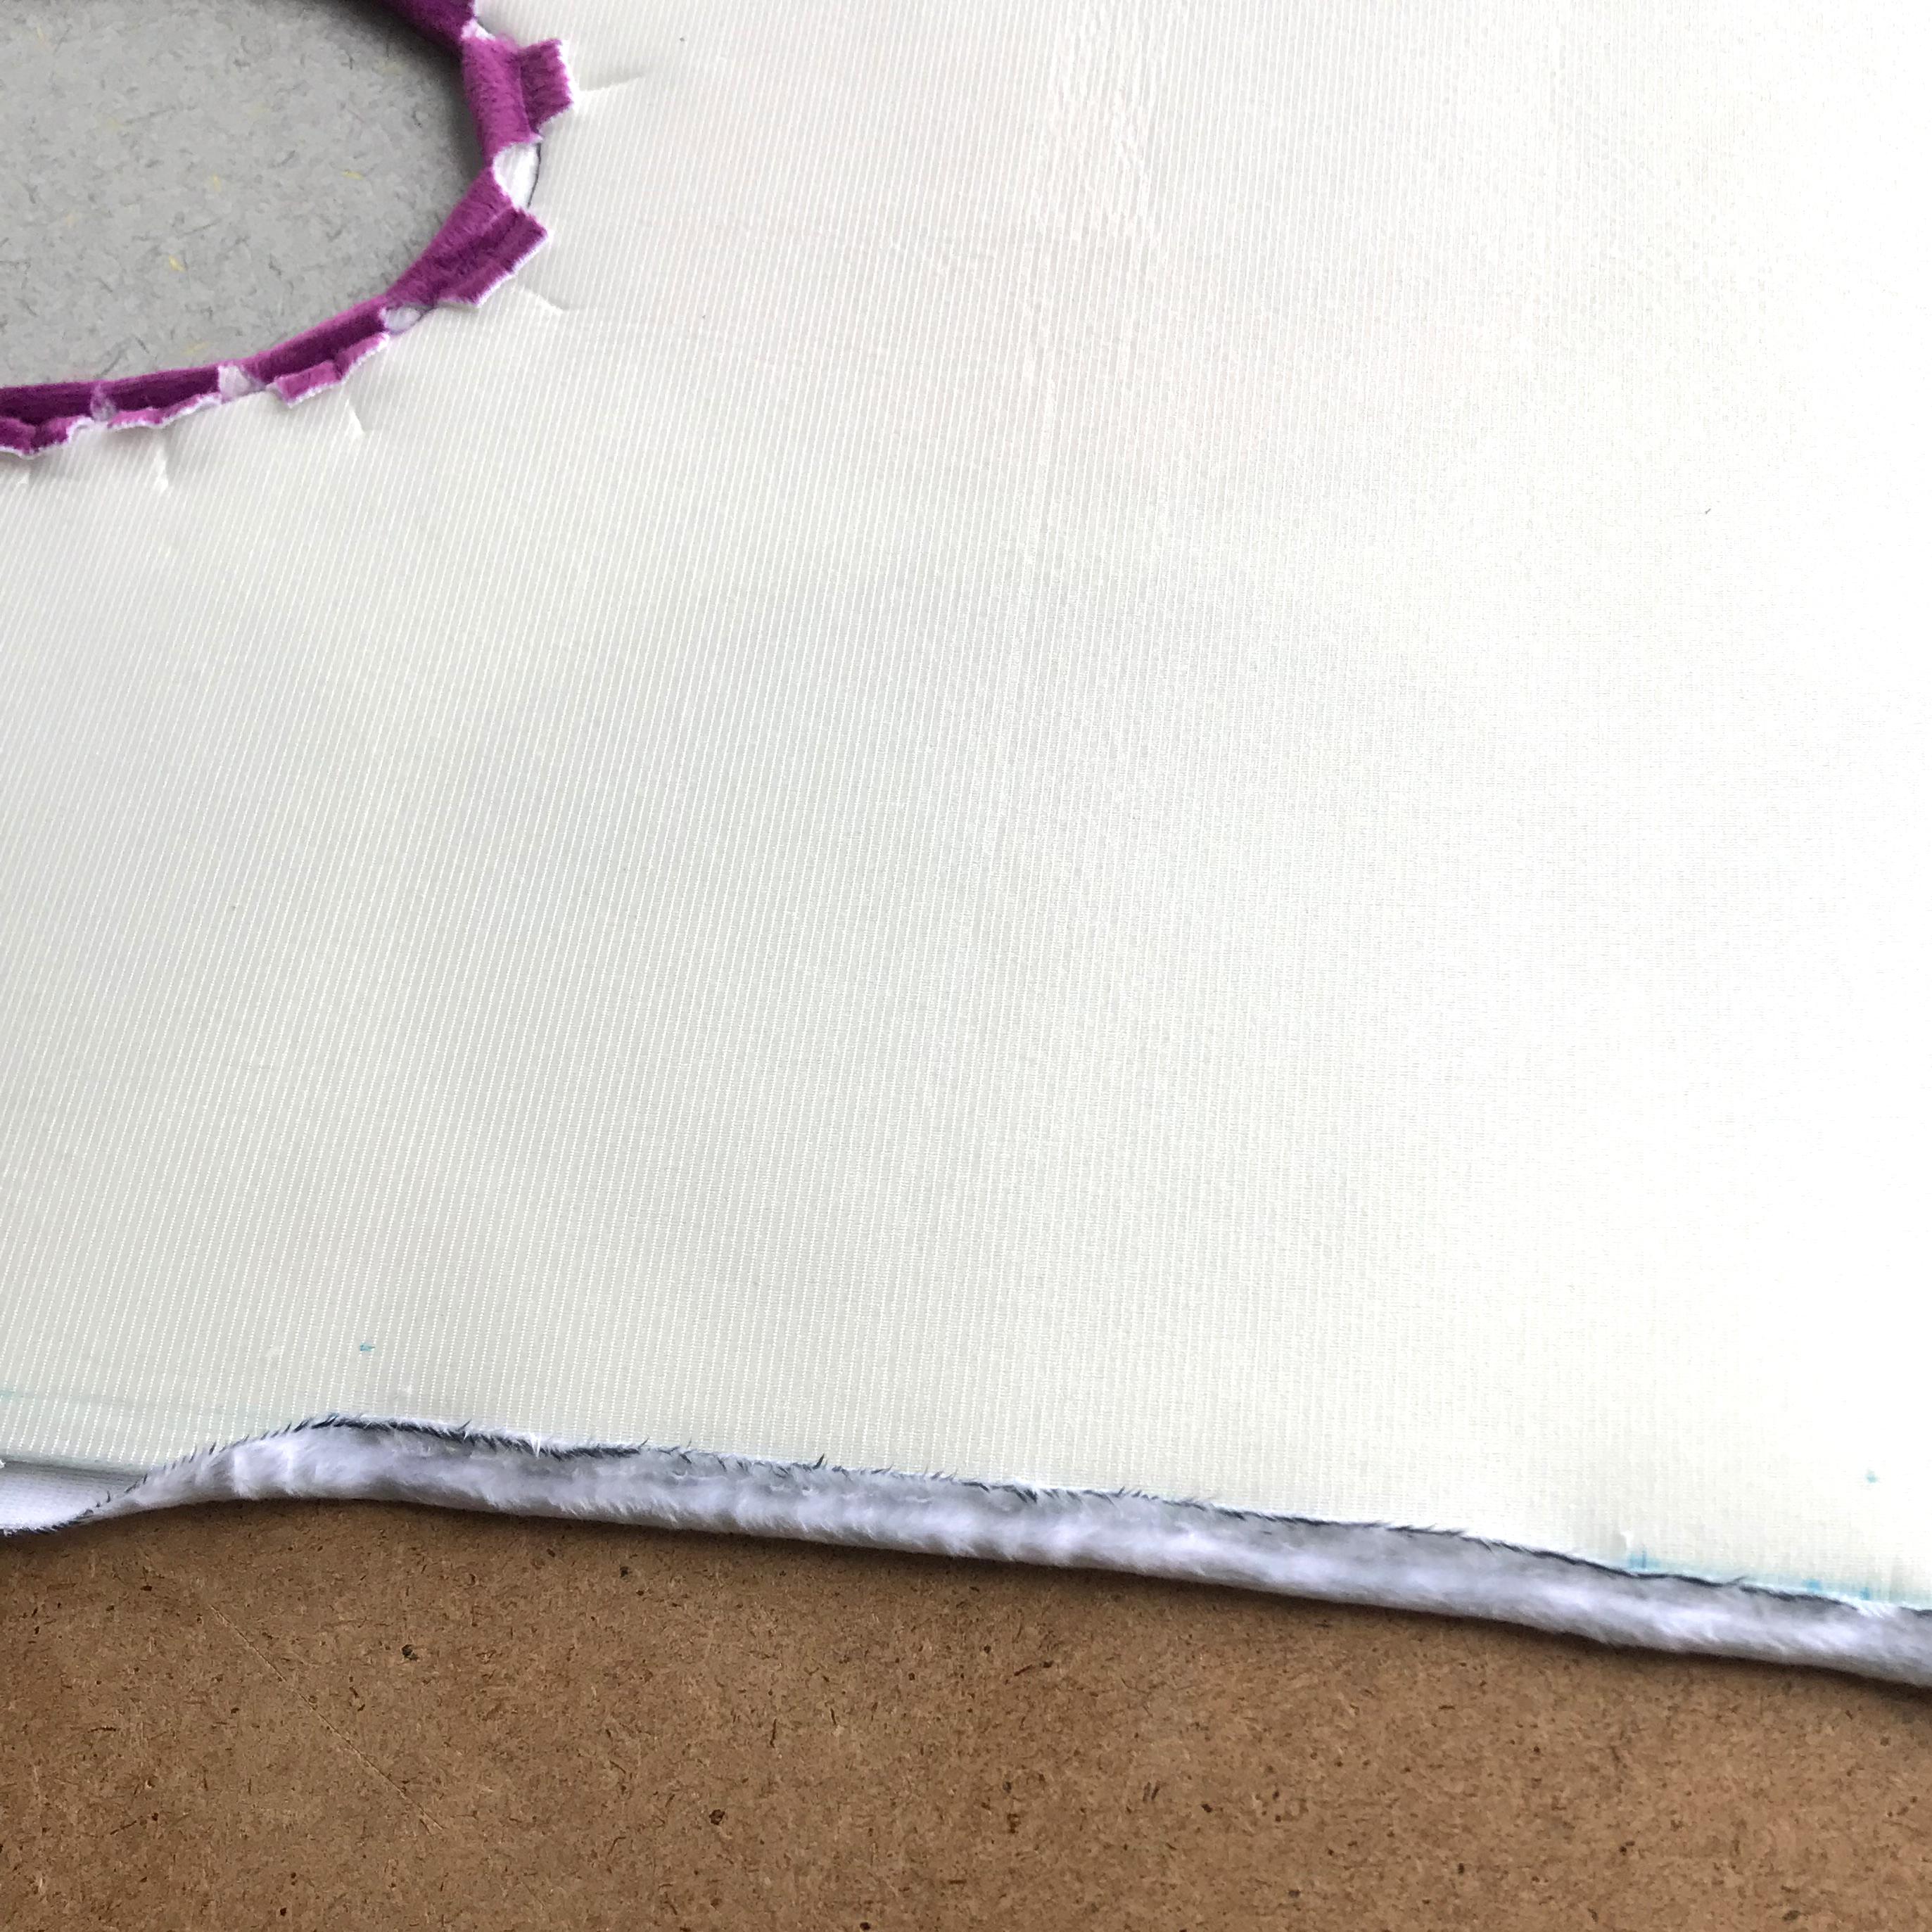 Handmade Halloween: The Paint Palette Every Tiny Artist Needs | Spoonflower Blog